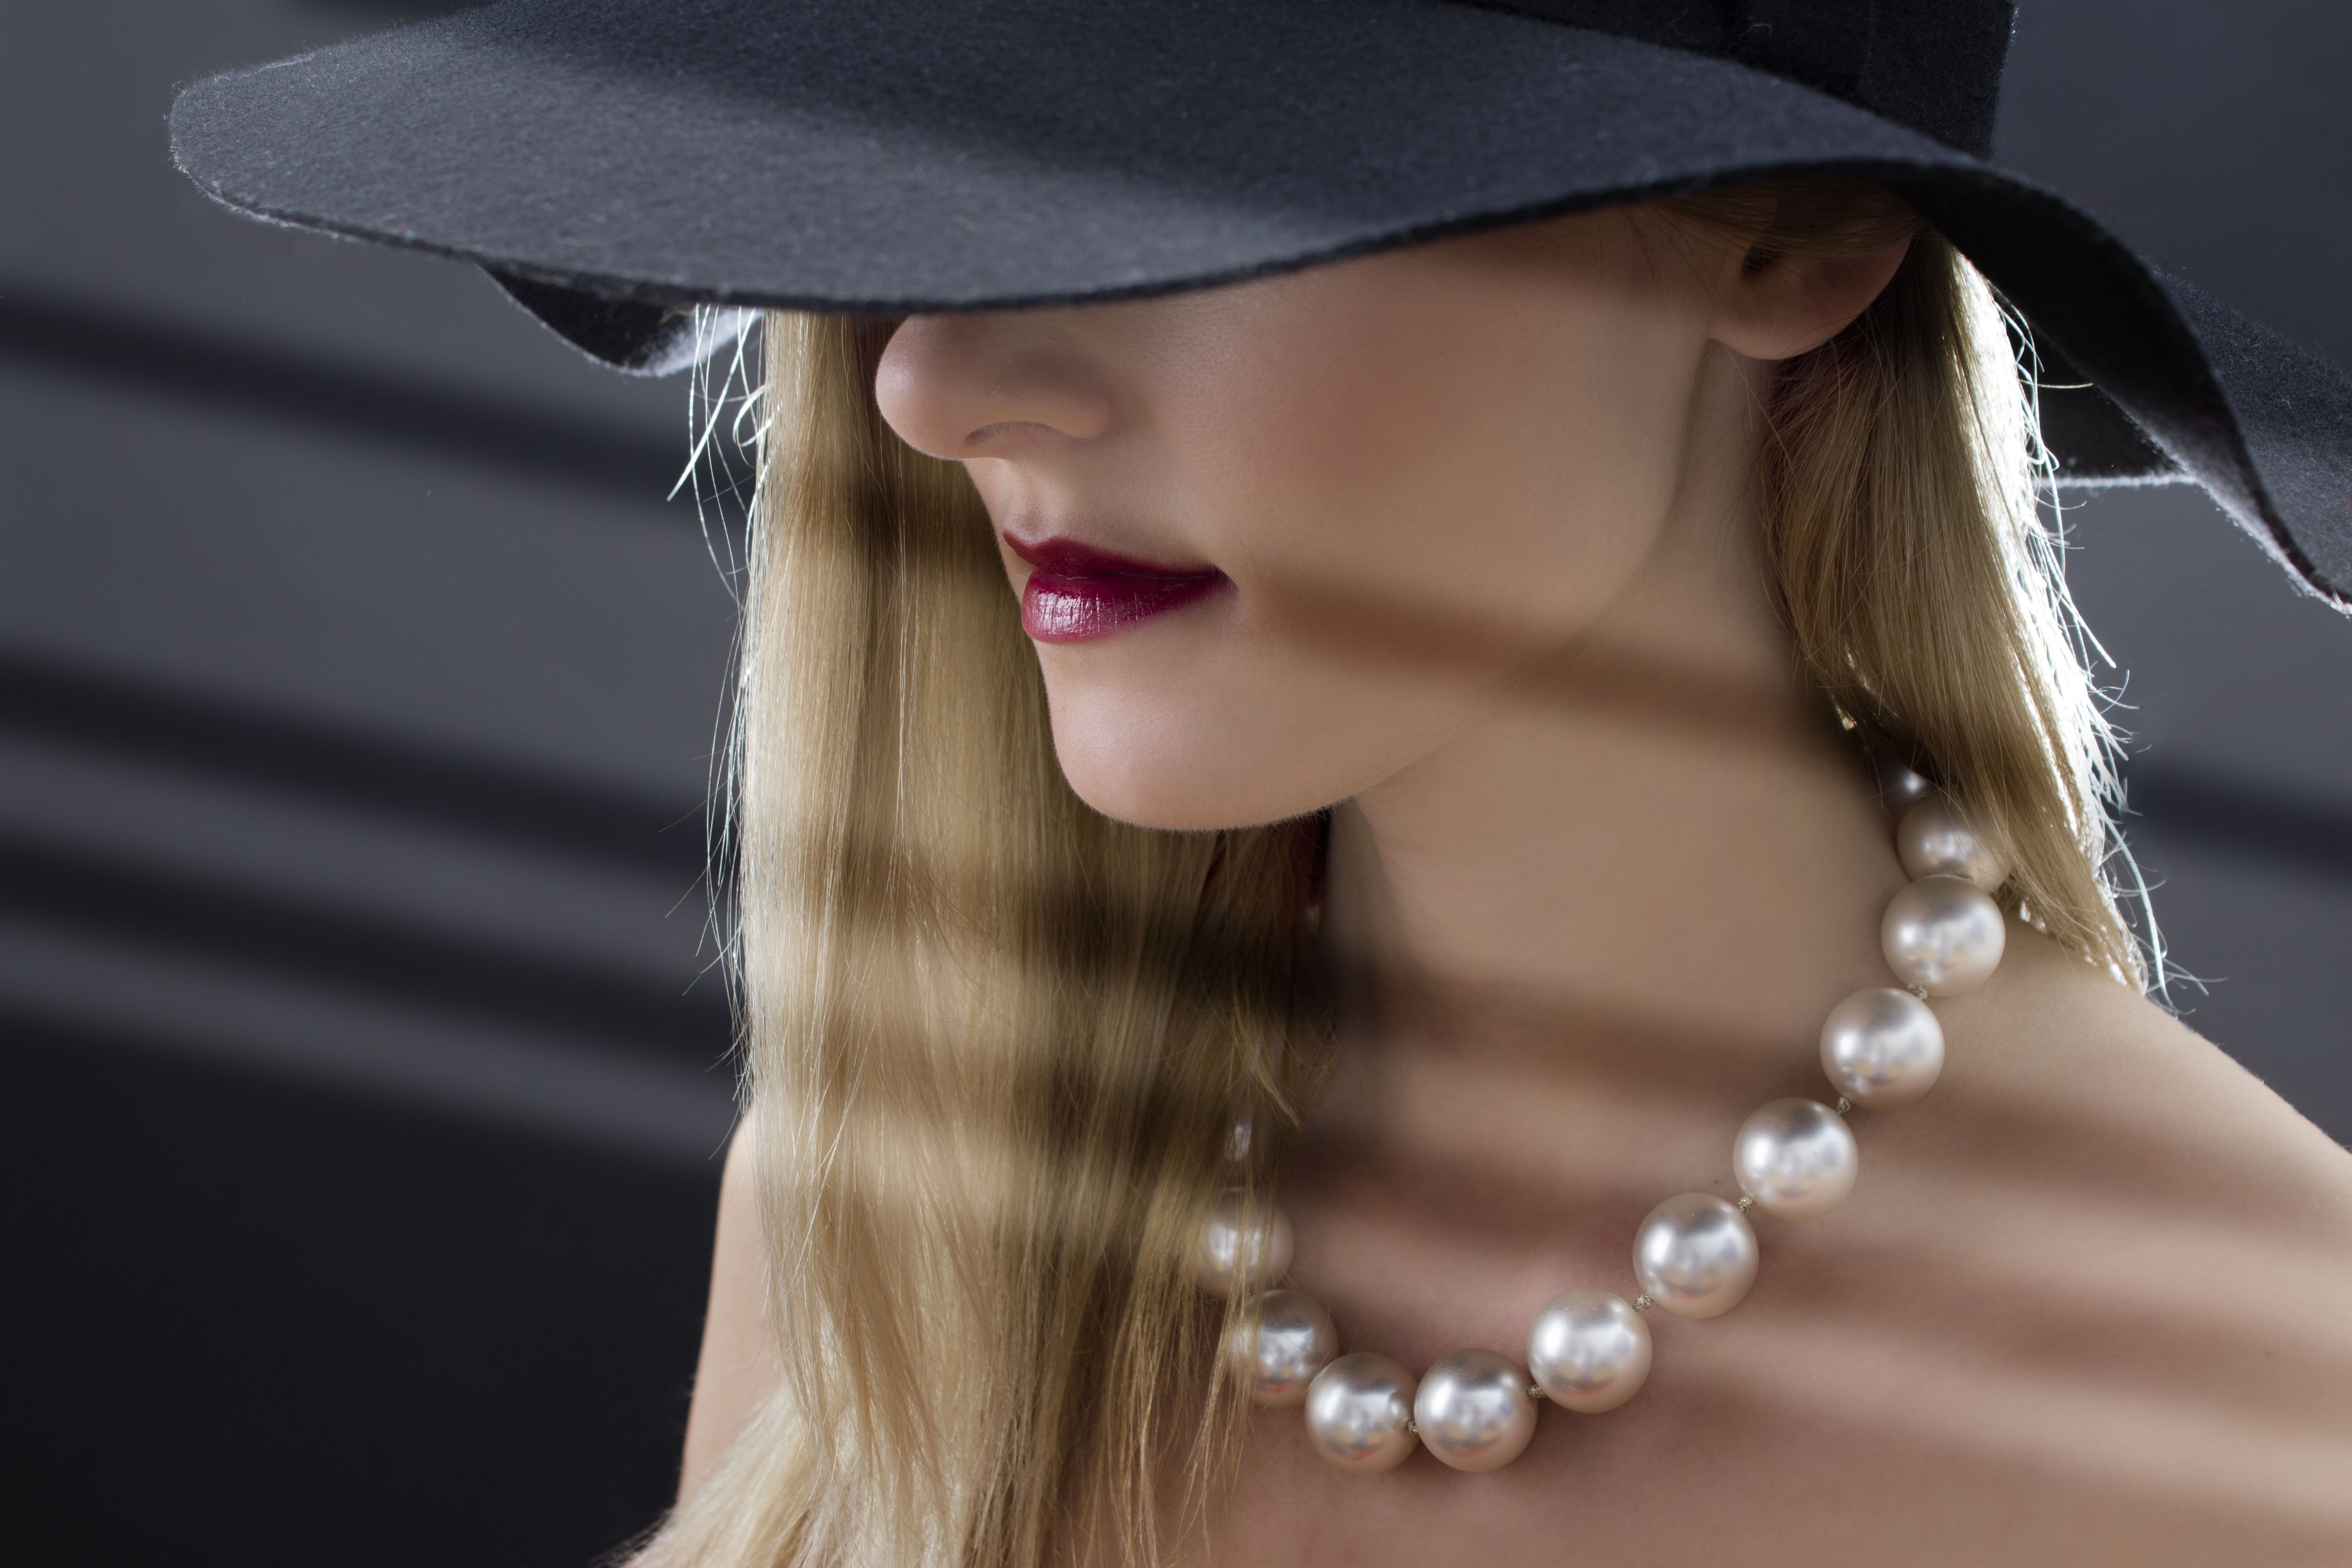 Woman Wearing Hat, Adult, Lipstick, Woman, Wear, HQ Photo